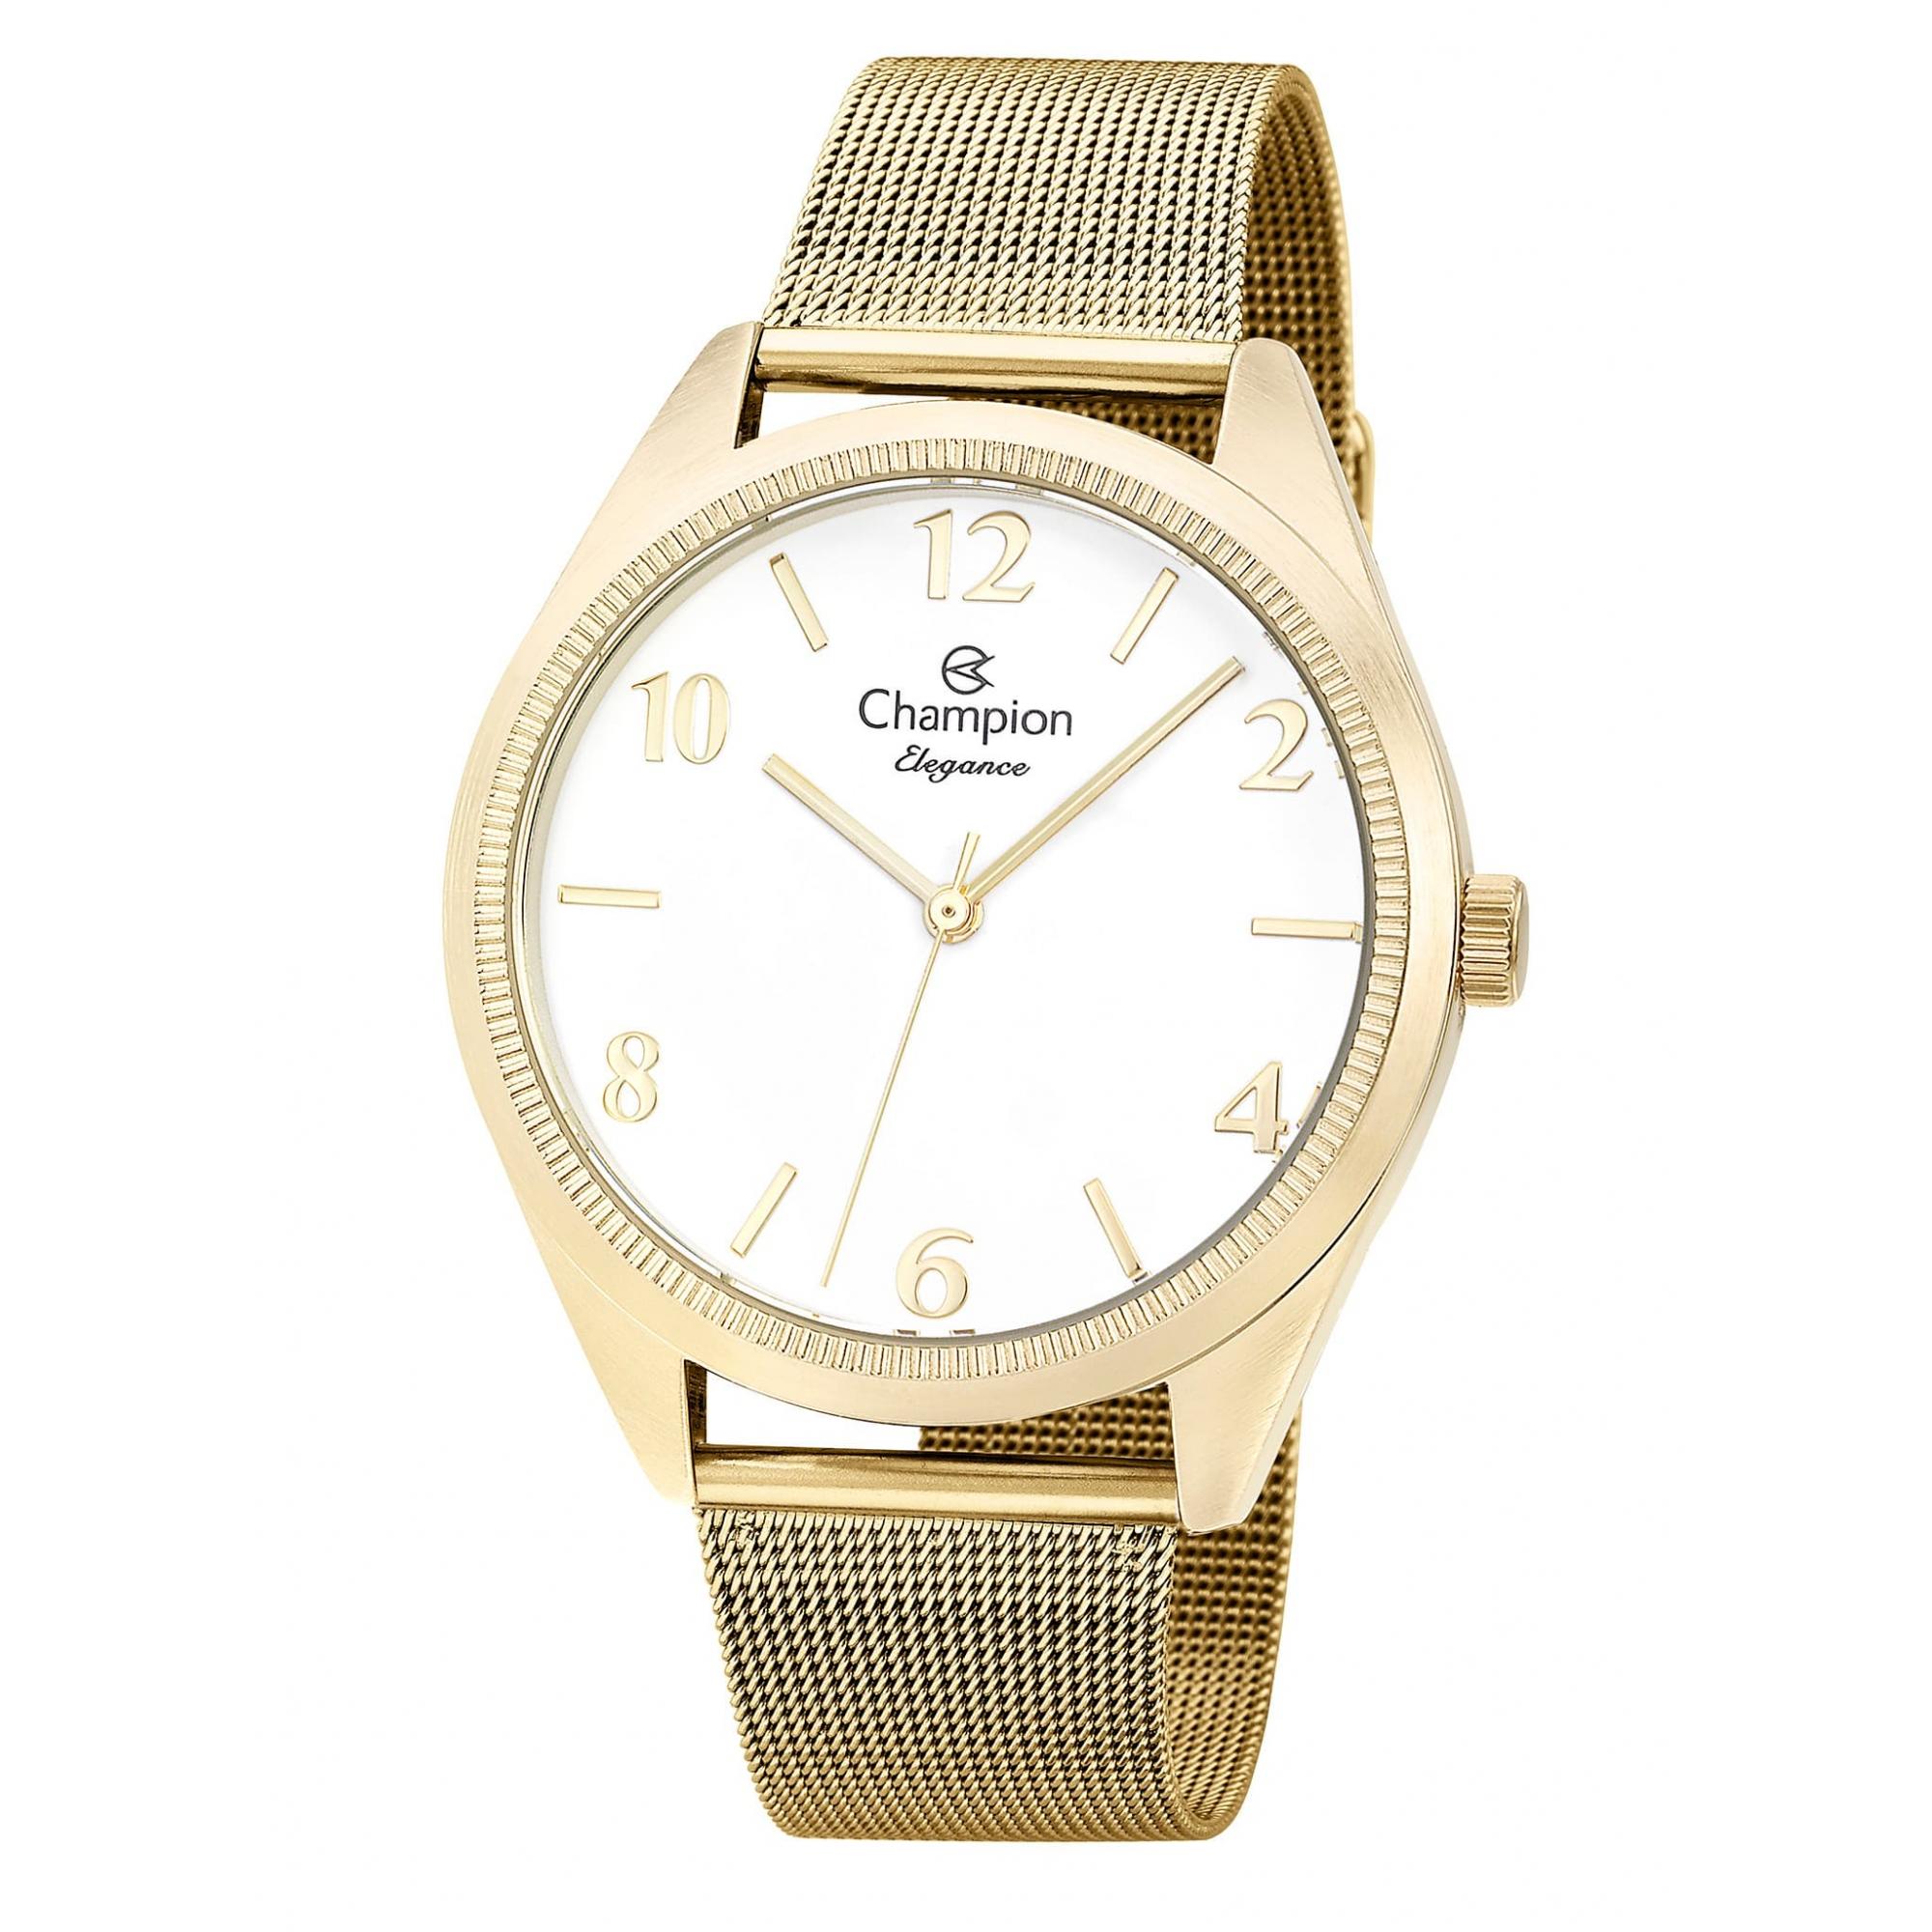 Relógio Champion Feminino Dourado - Elegance - CN25172M